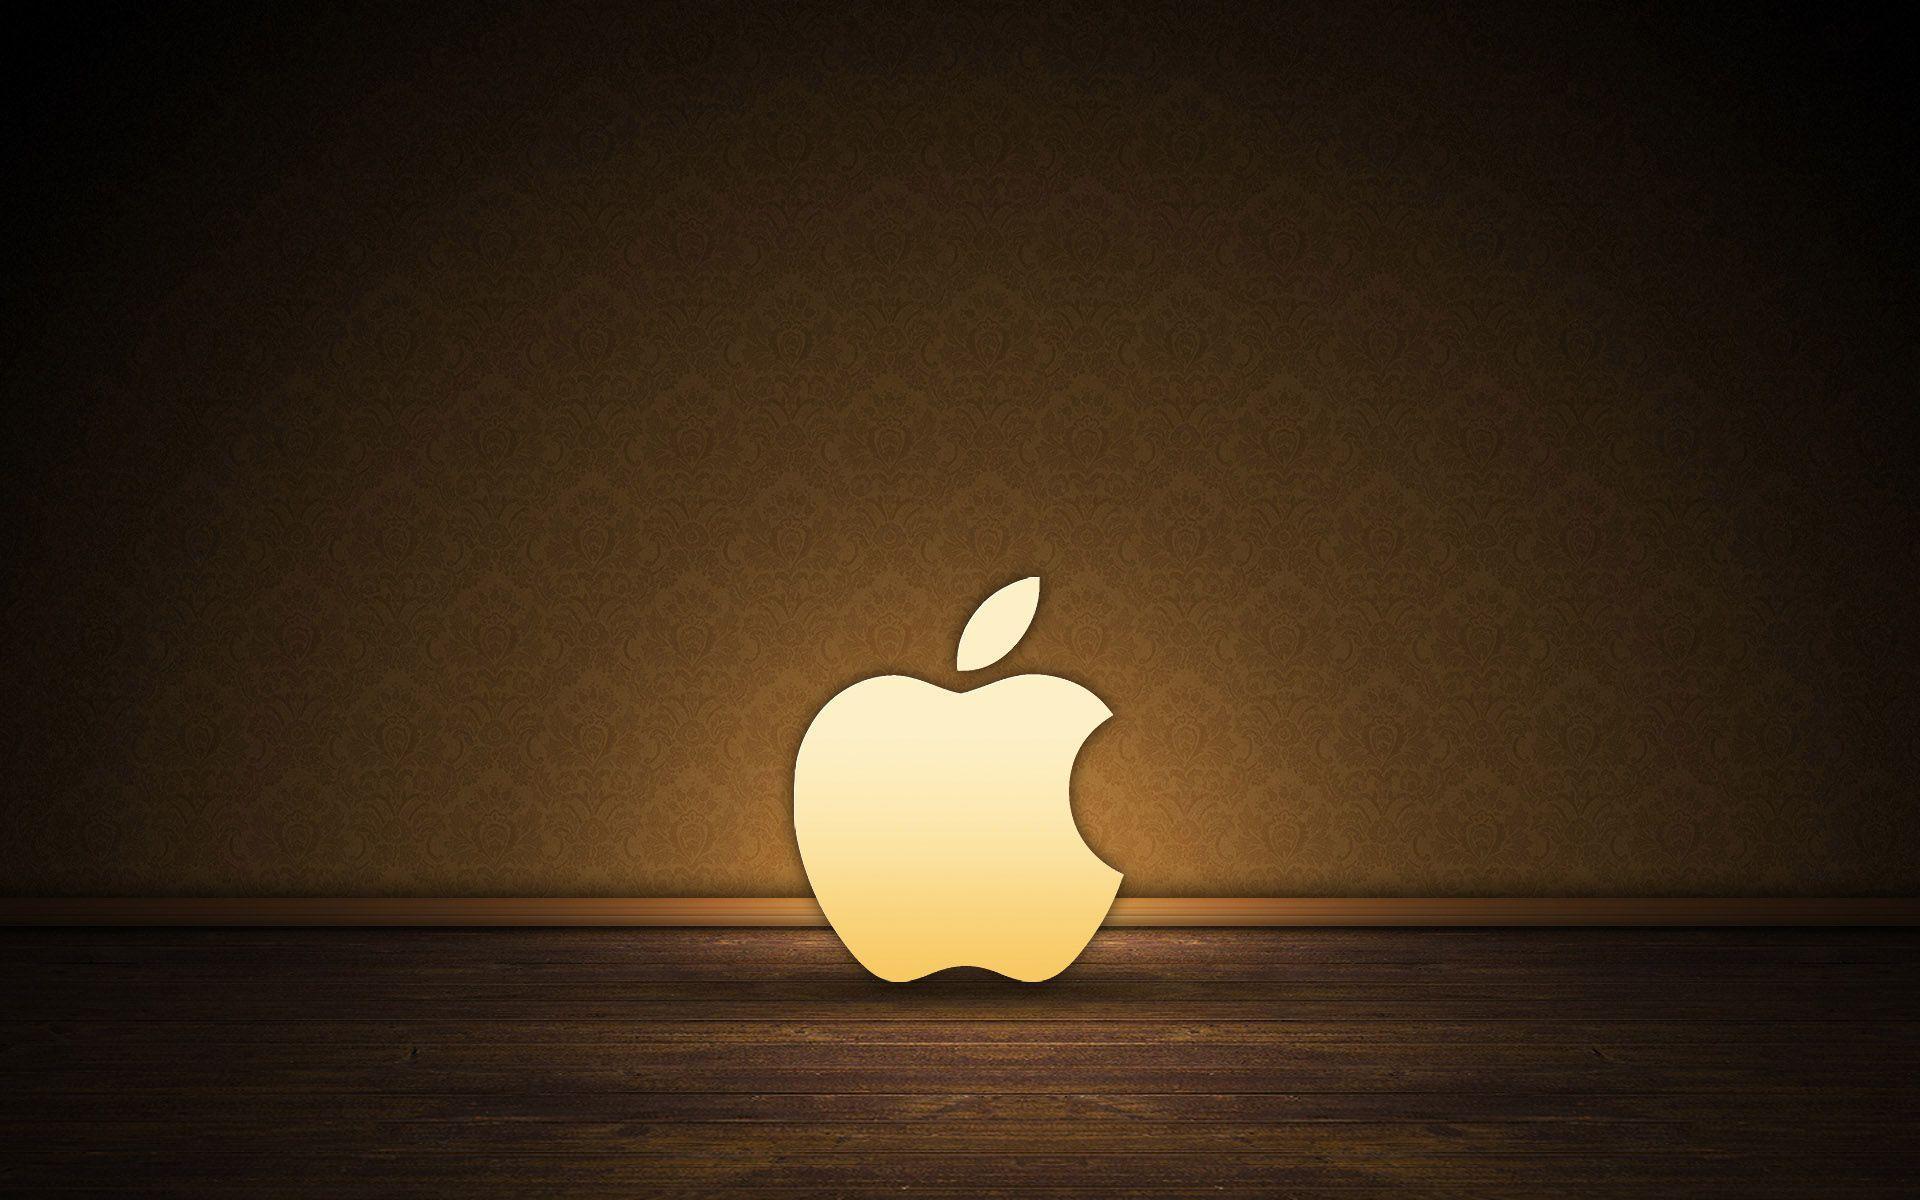 Unduh 7000 Wallpaper Apple Logo Gold  Gratis